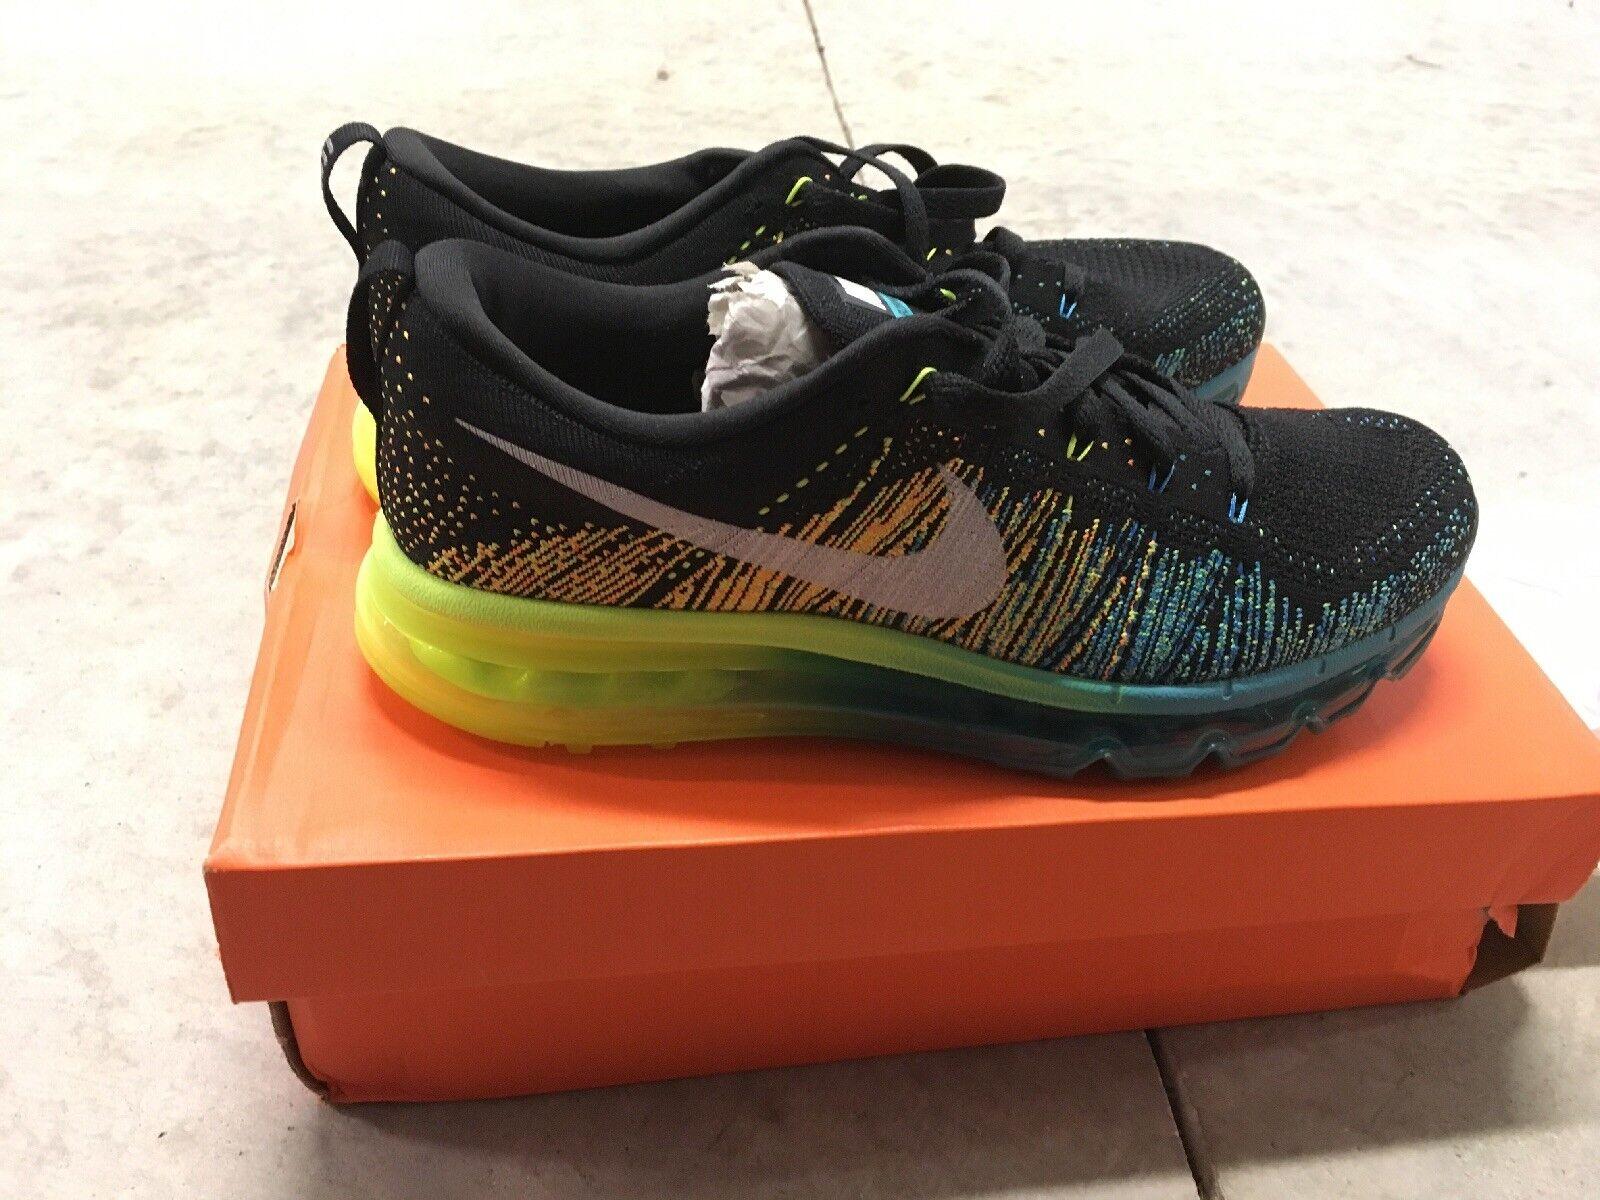 Nike Flyknit Max men's Running Shoe Black/Teal/neon yellow 620469 001 NIB Sz 8